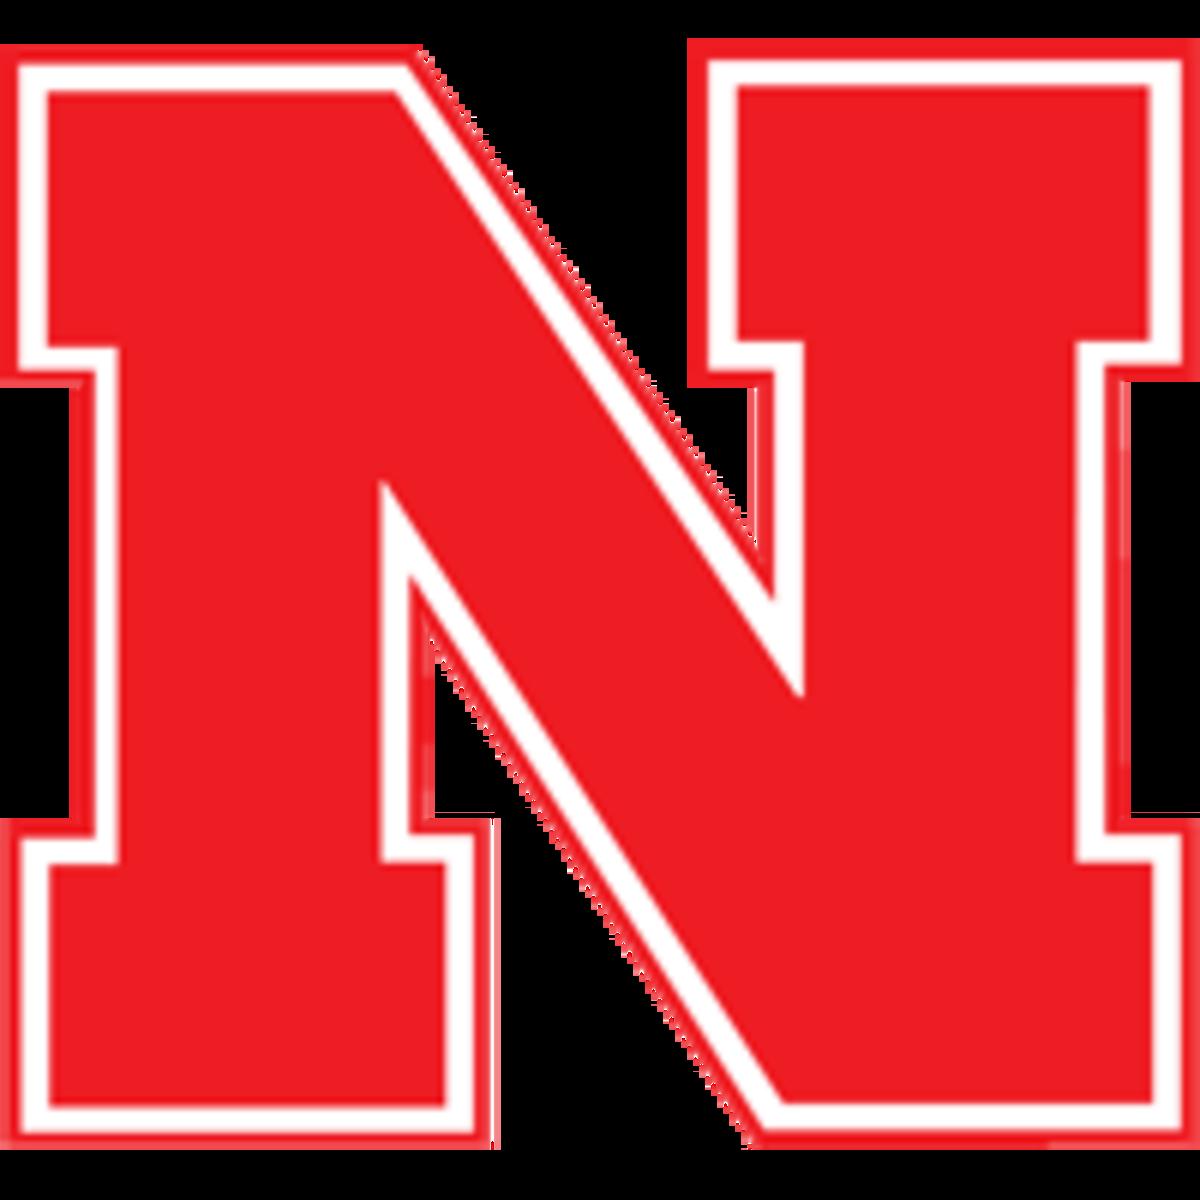 Nebraska's college football logo